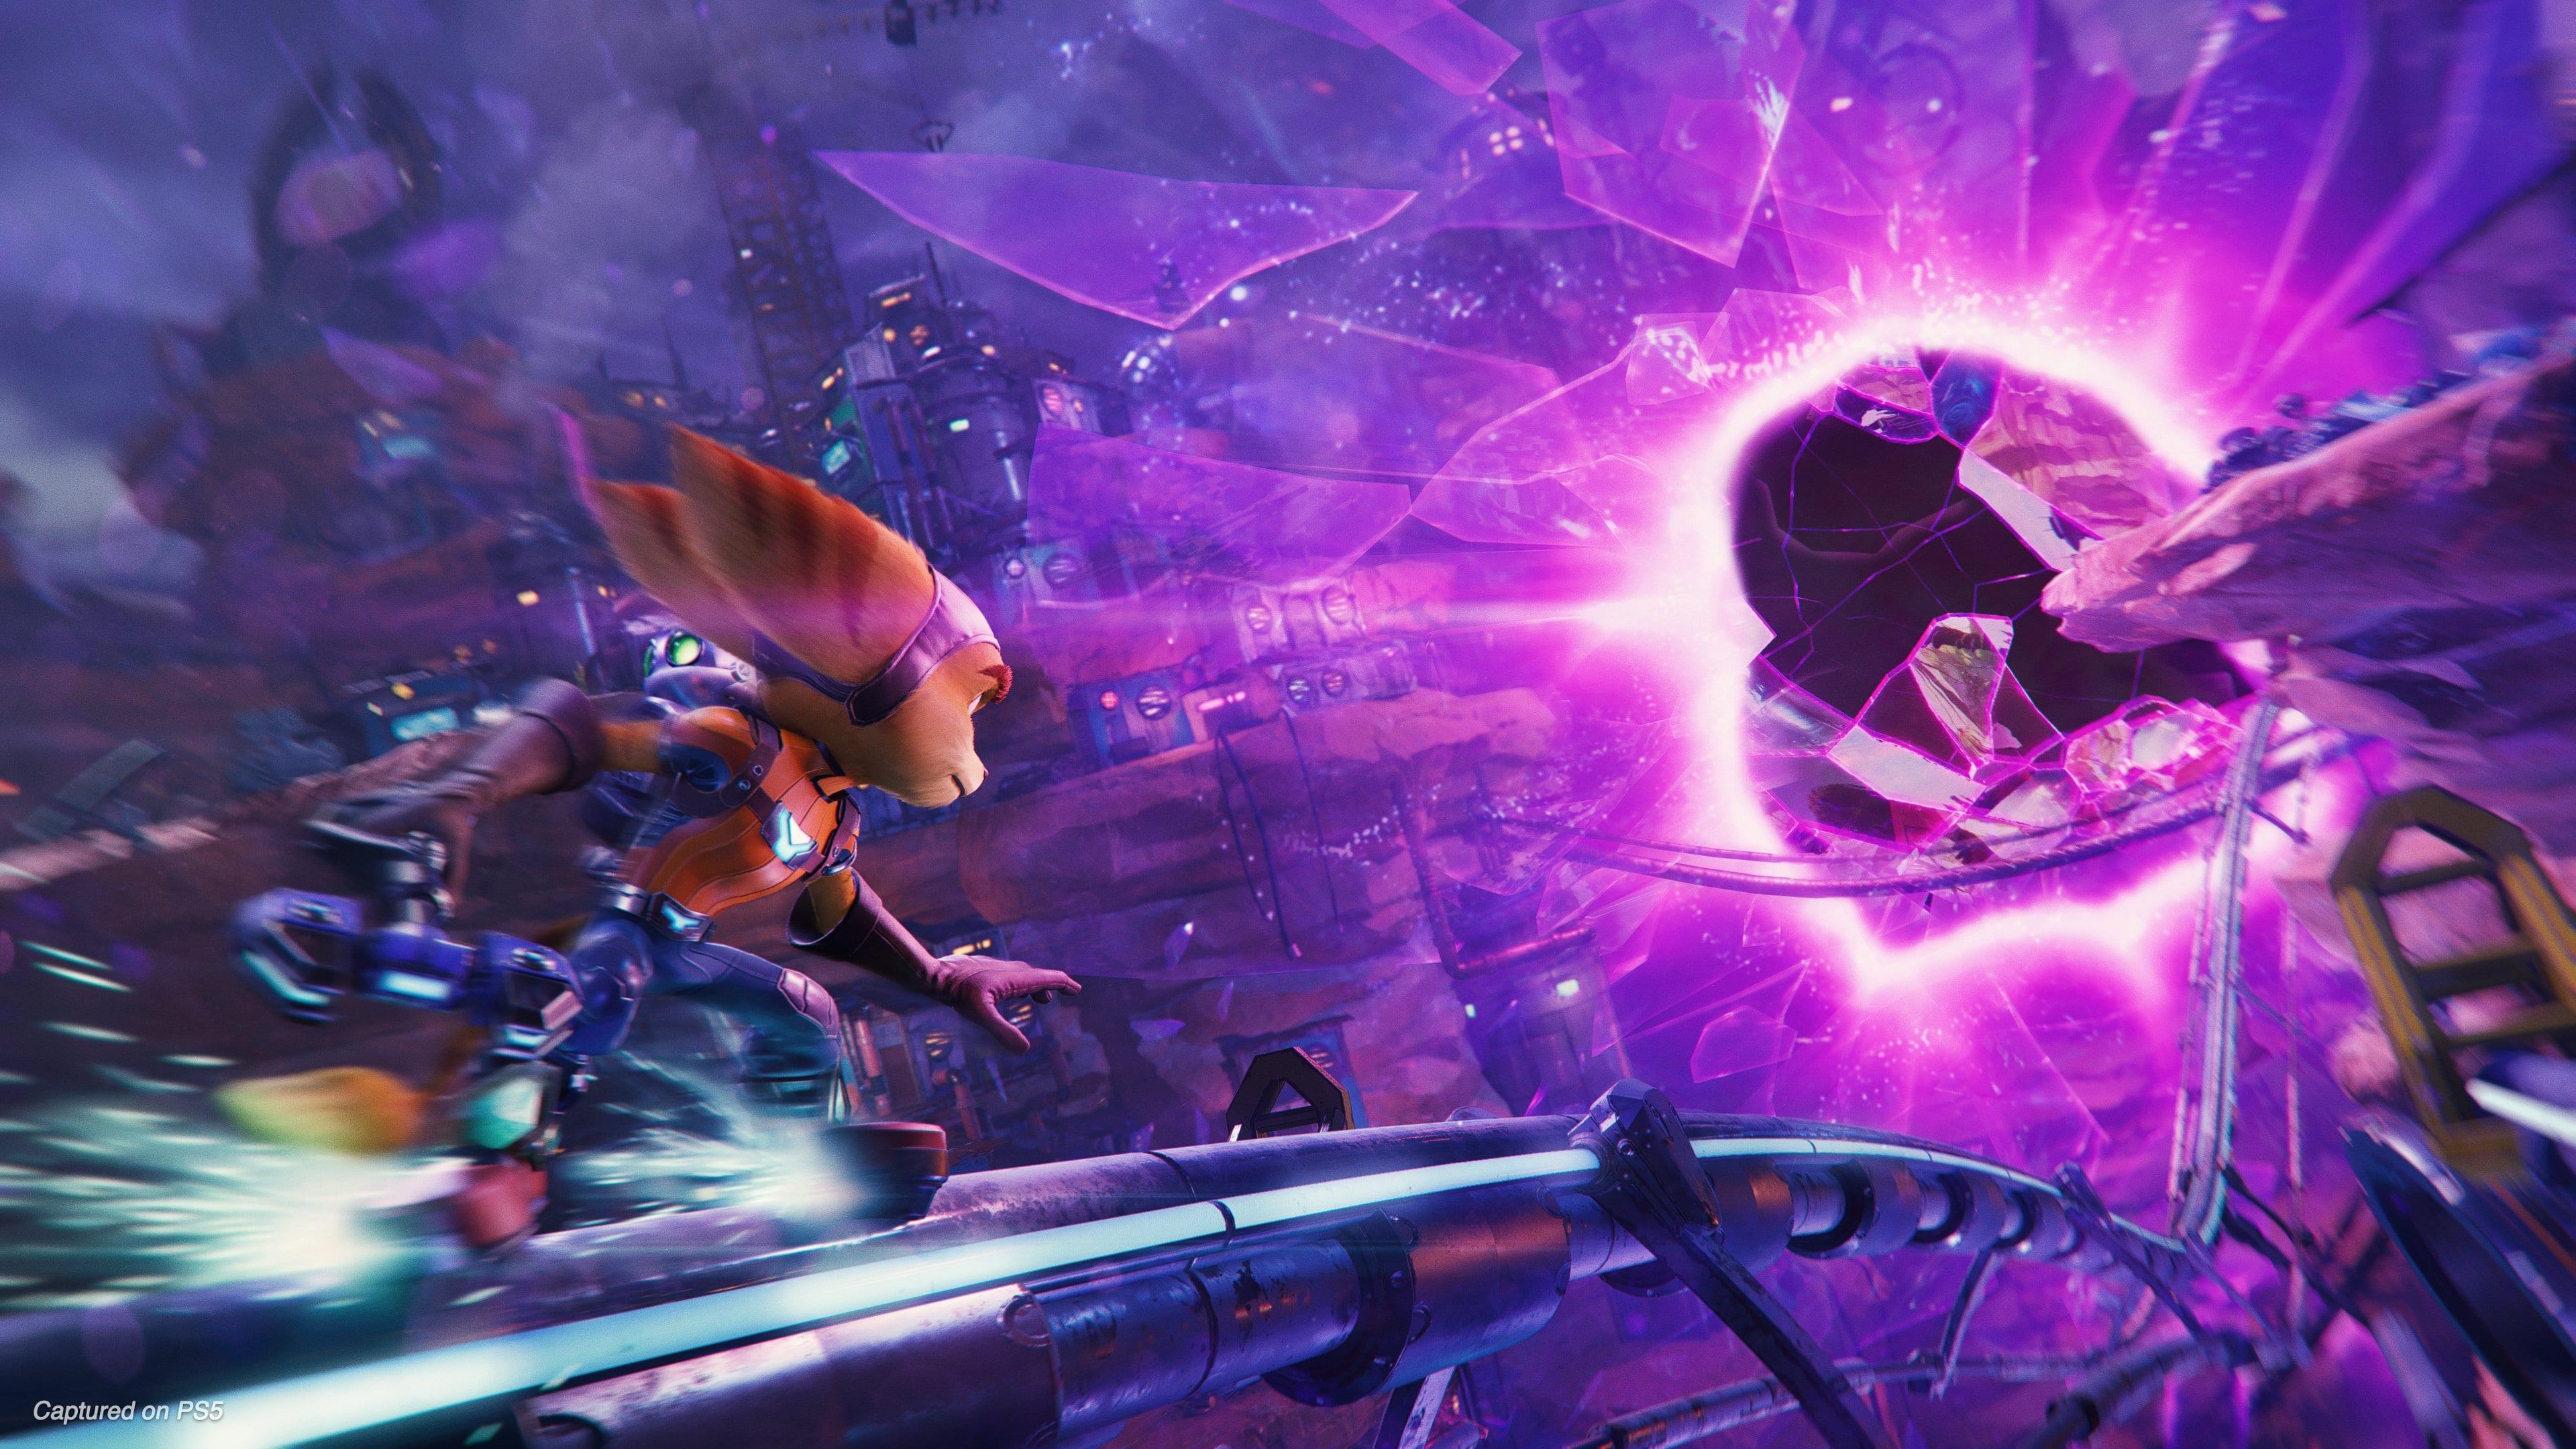 Ratchet Clank Rift Apart PS5 Gameplay Trailer